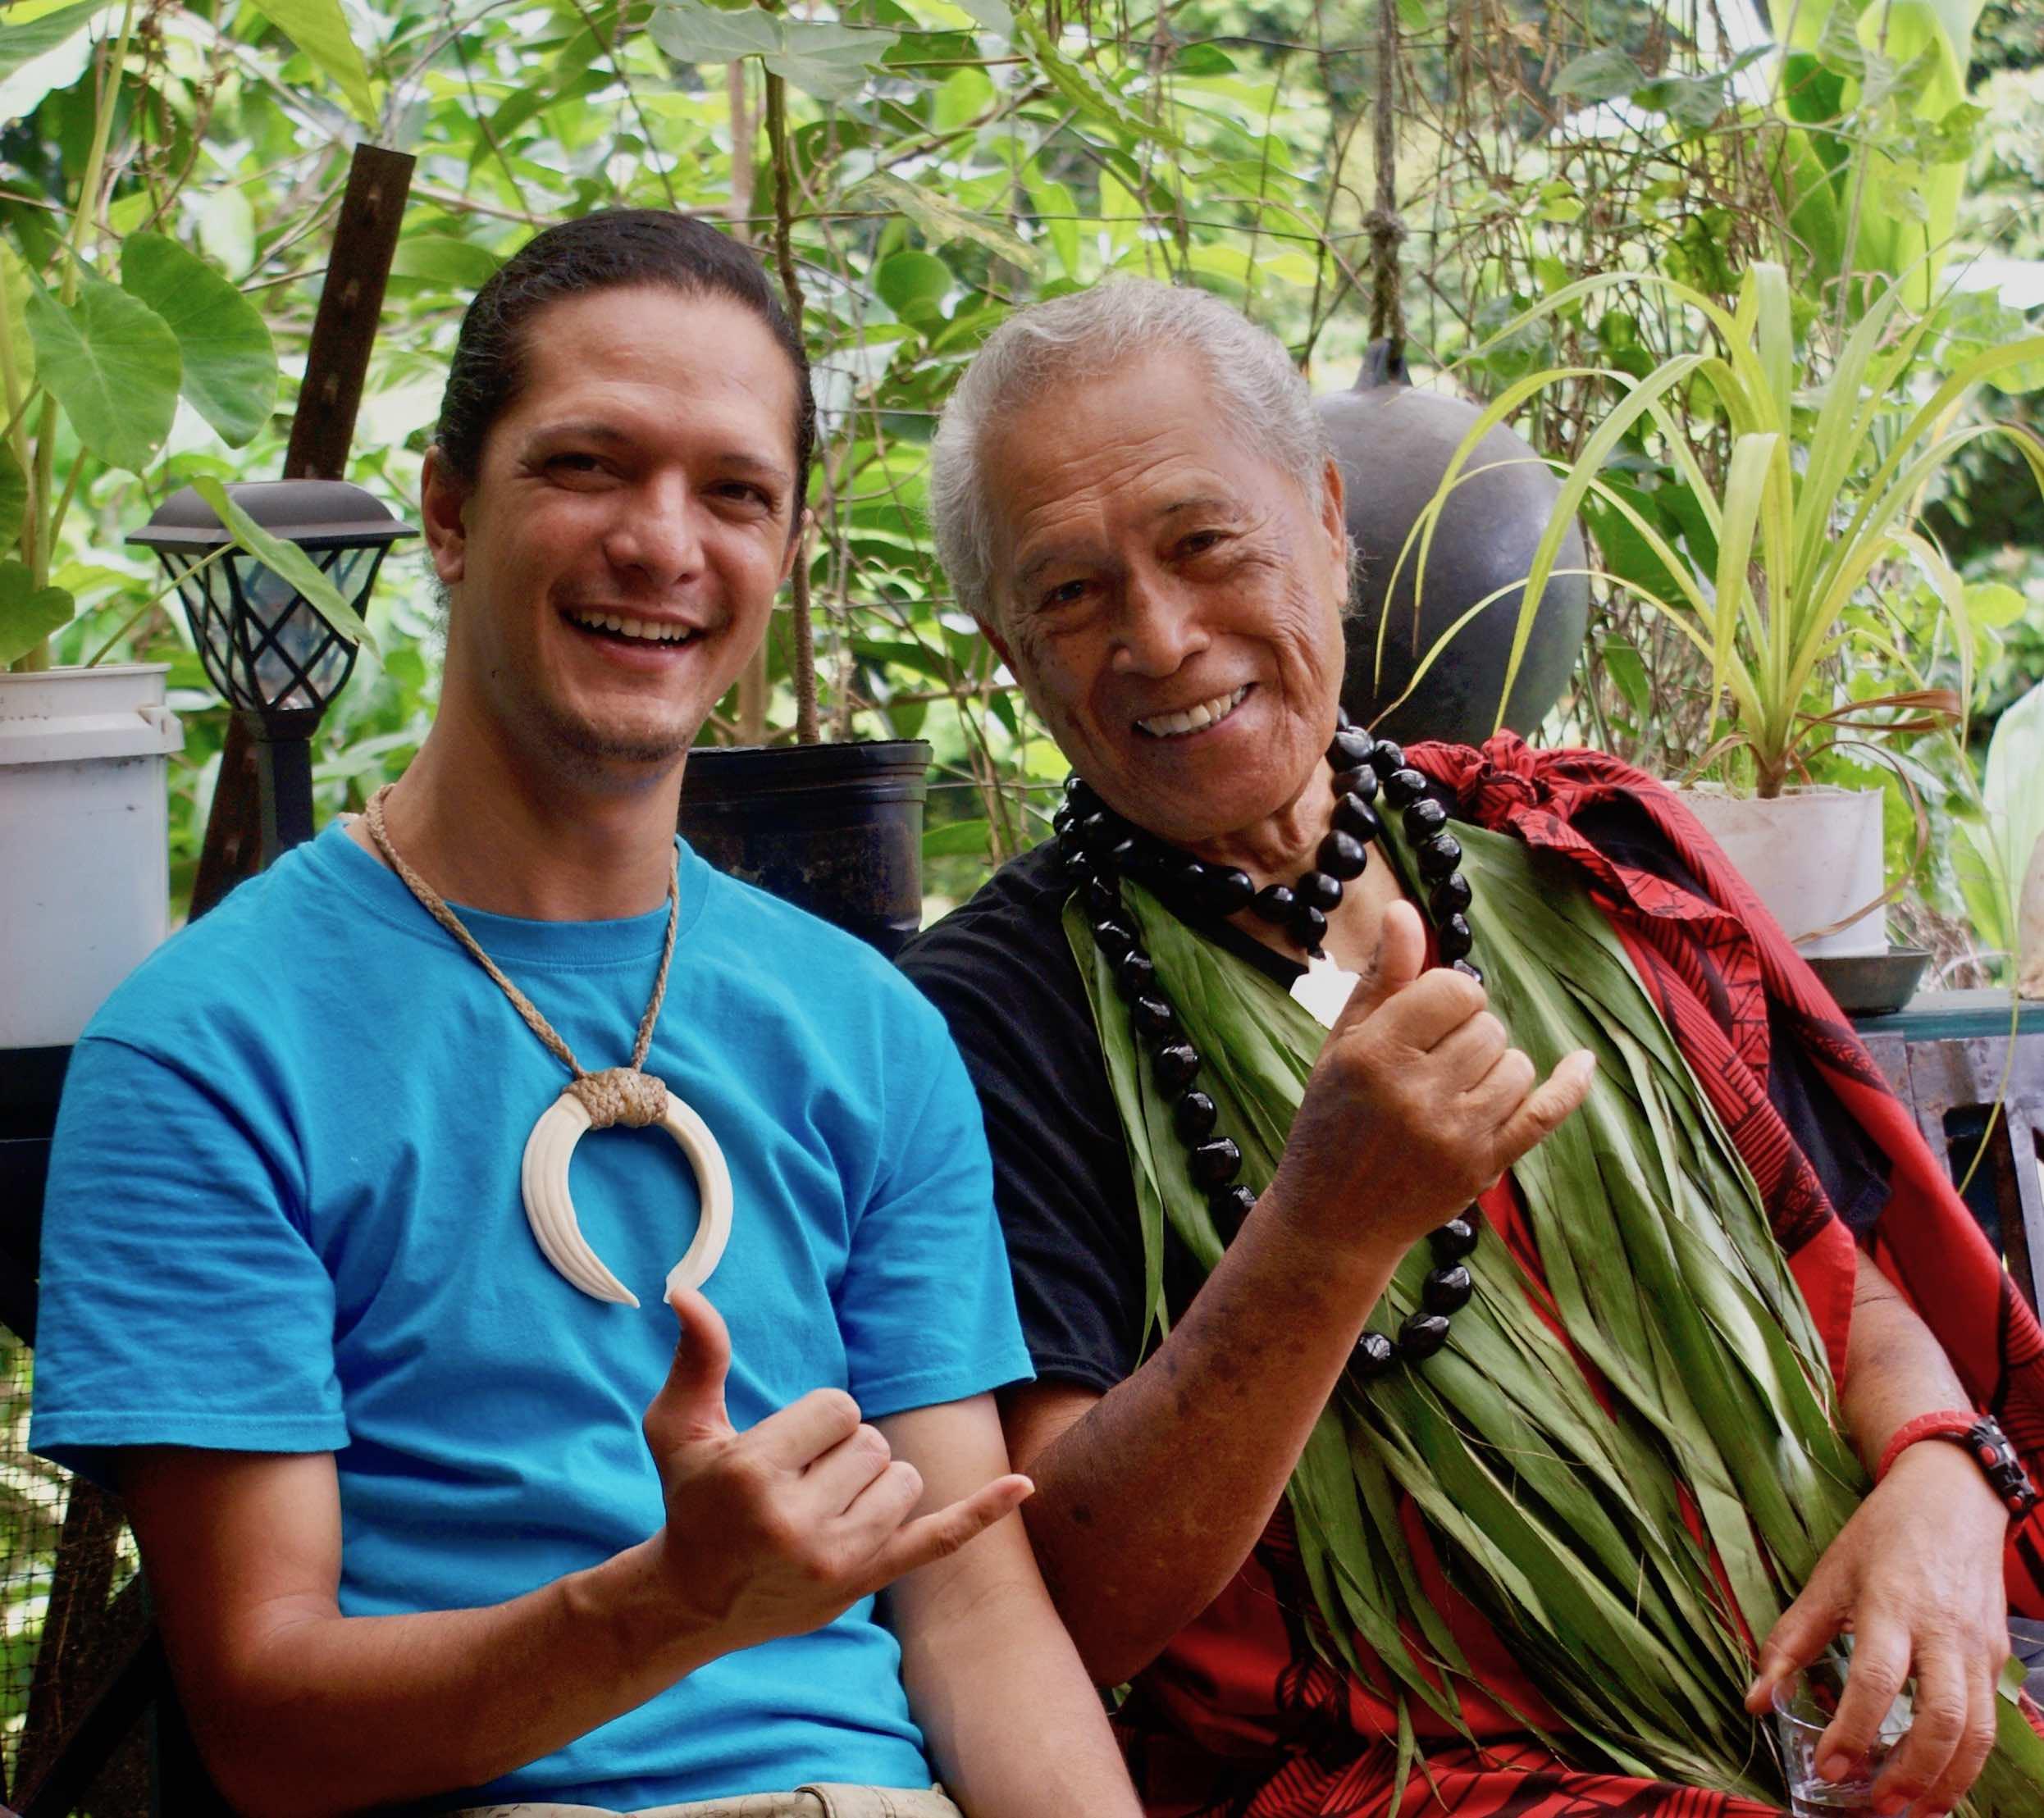 49th Generation Anakala Pilipo Solatorio & 51st generation Kumu Paʻa Kawika Foster of Mana O Kahiko